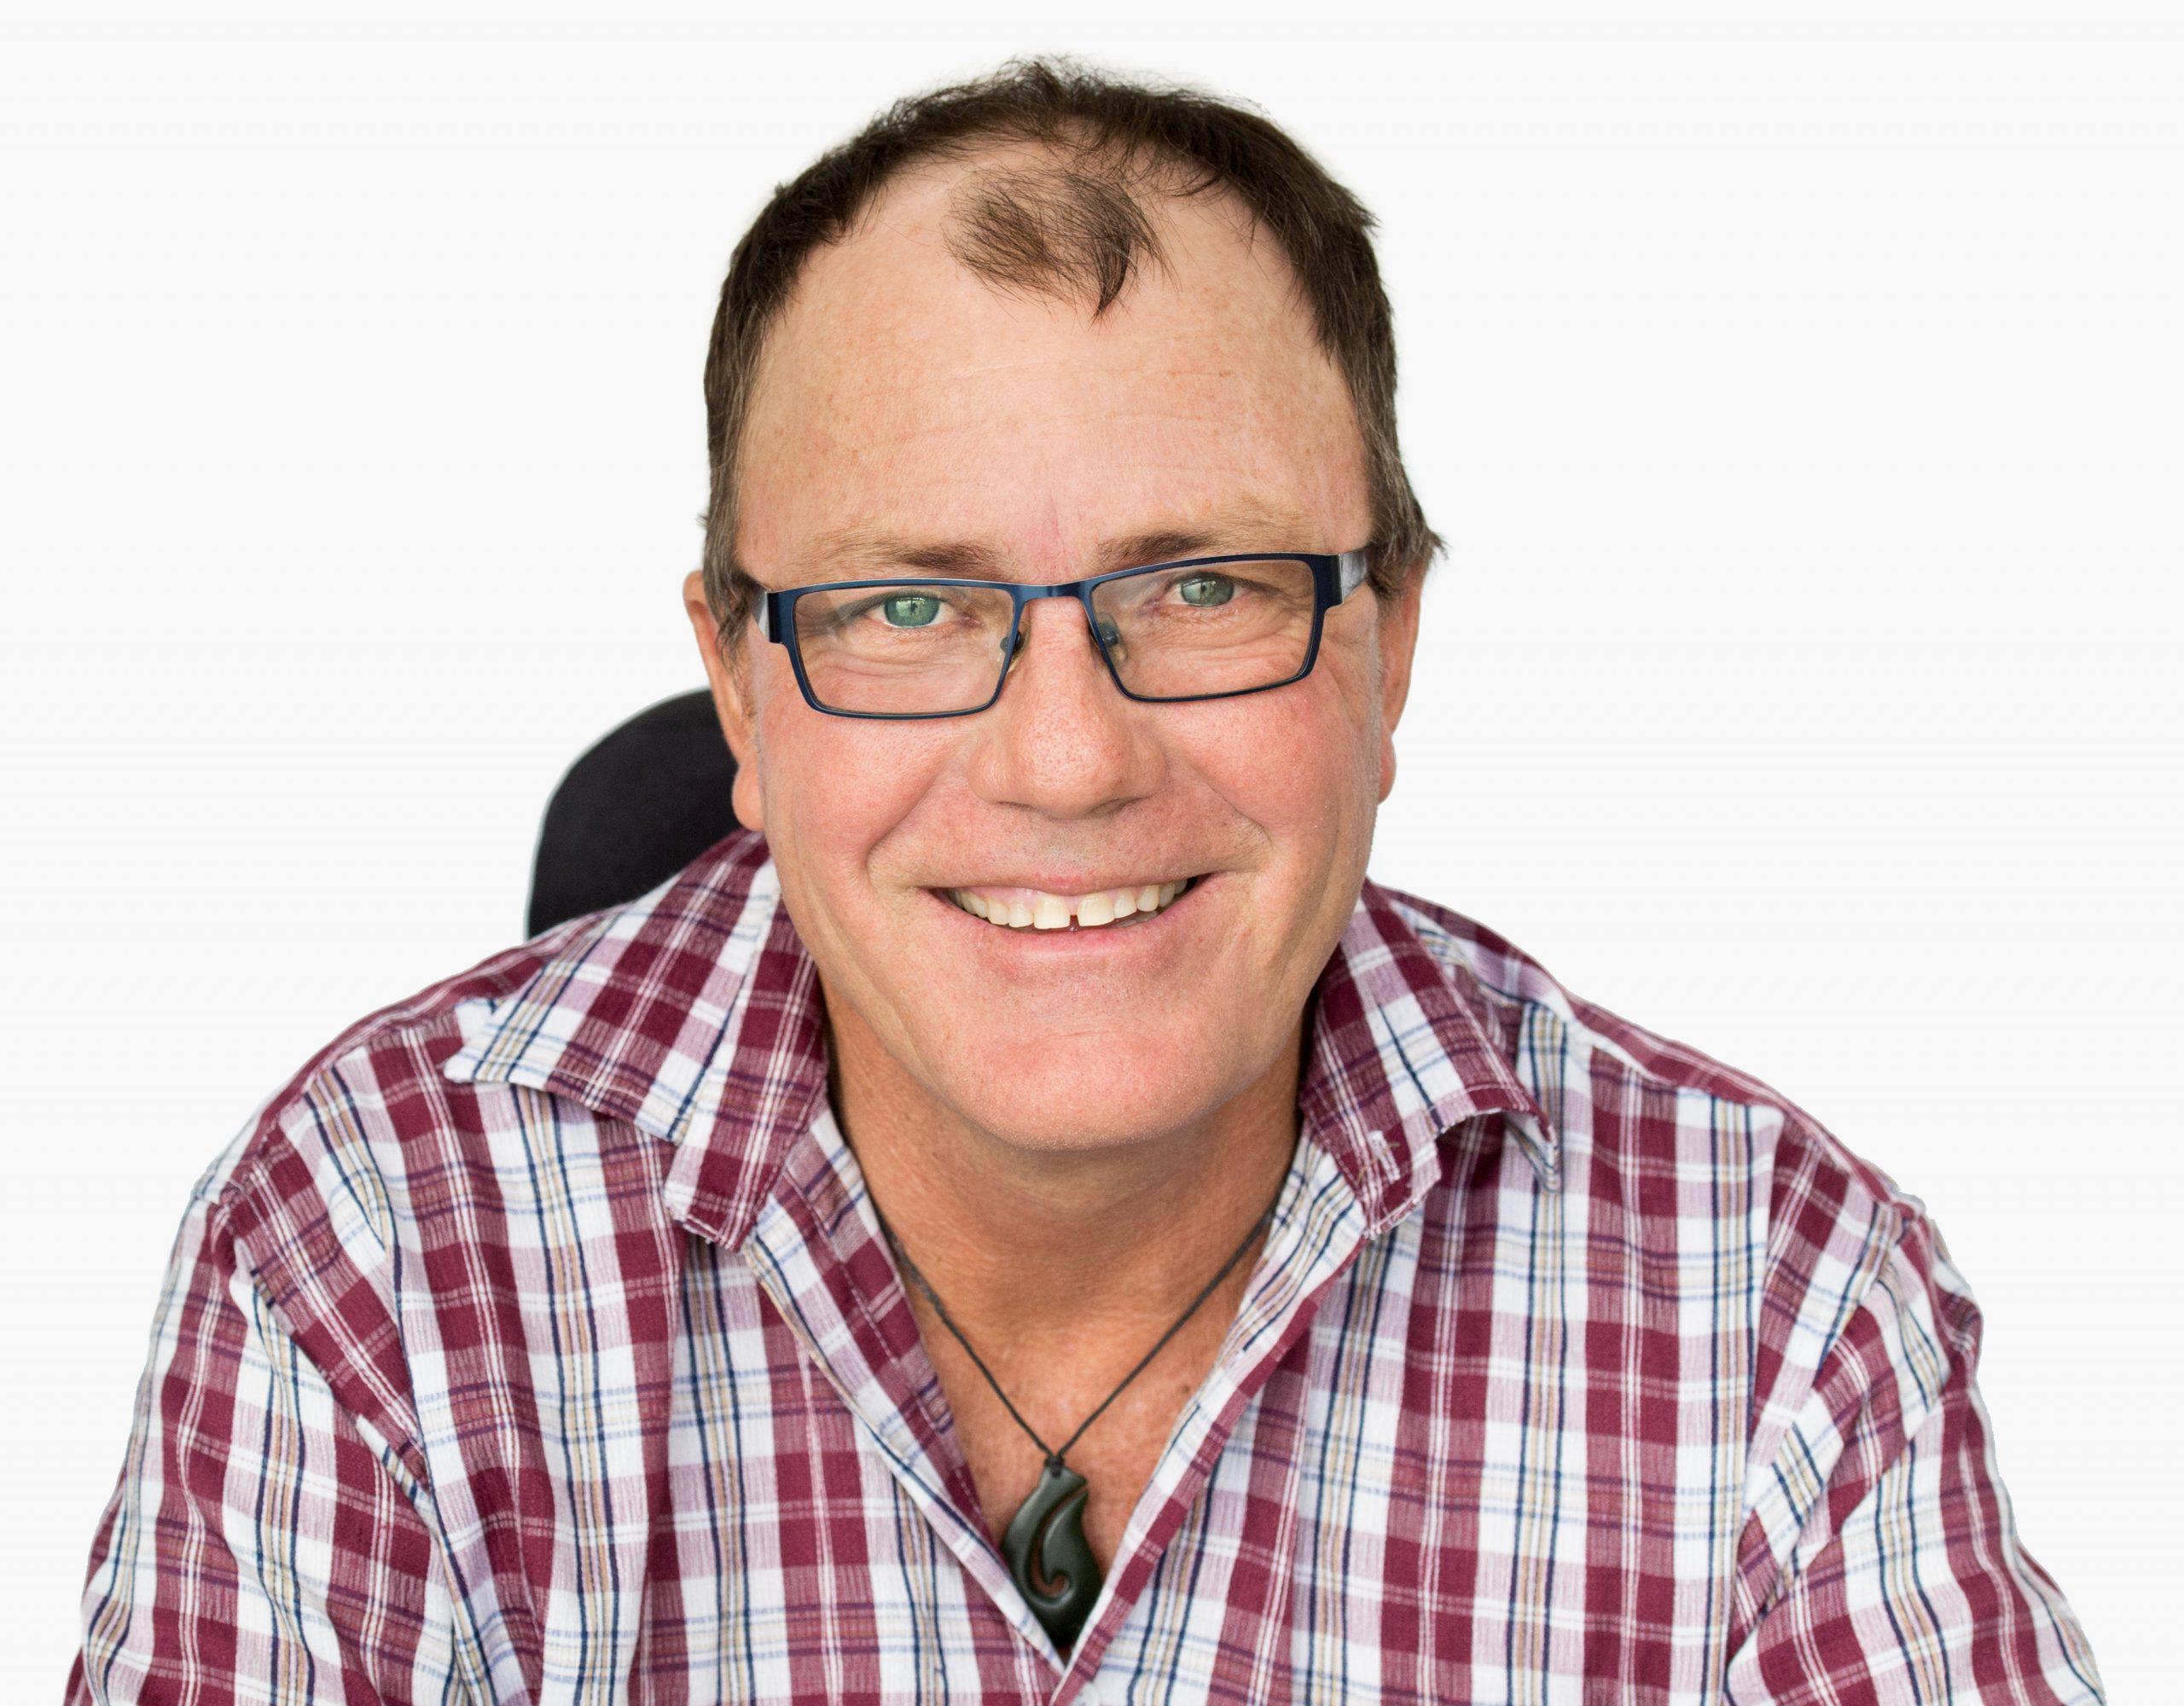 man with glasses and a checkered shirt smiling at camera